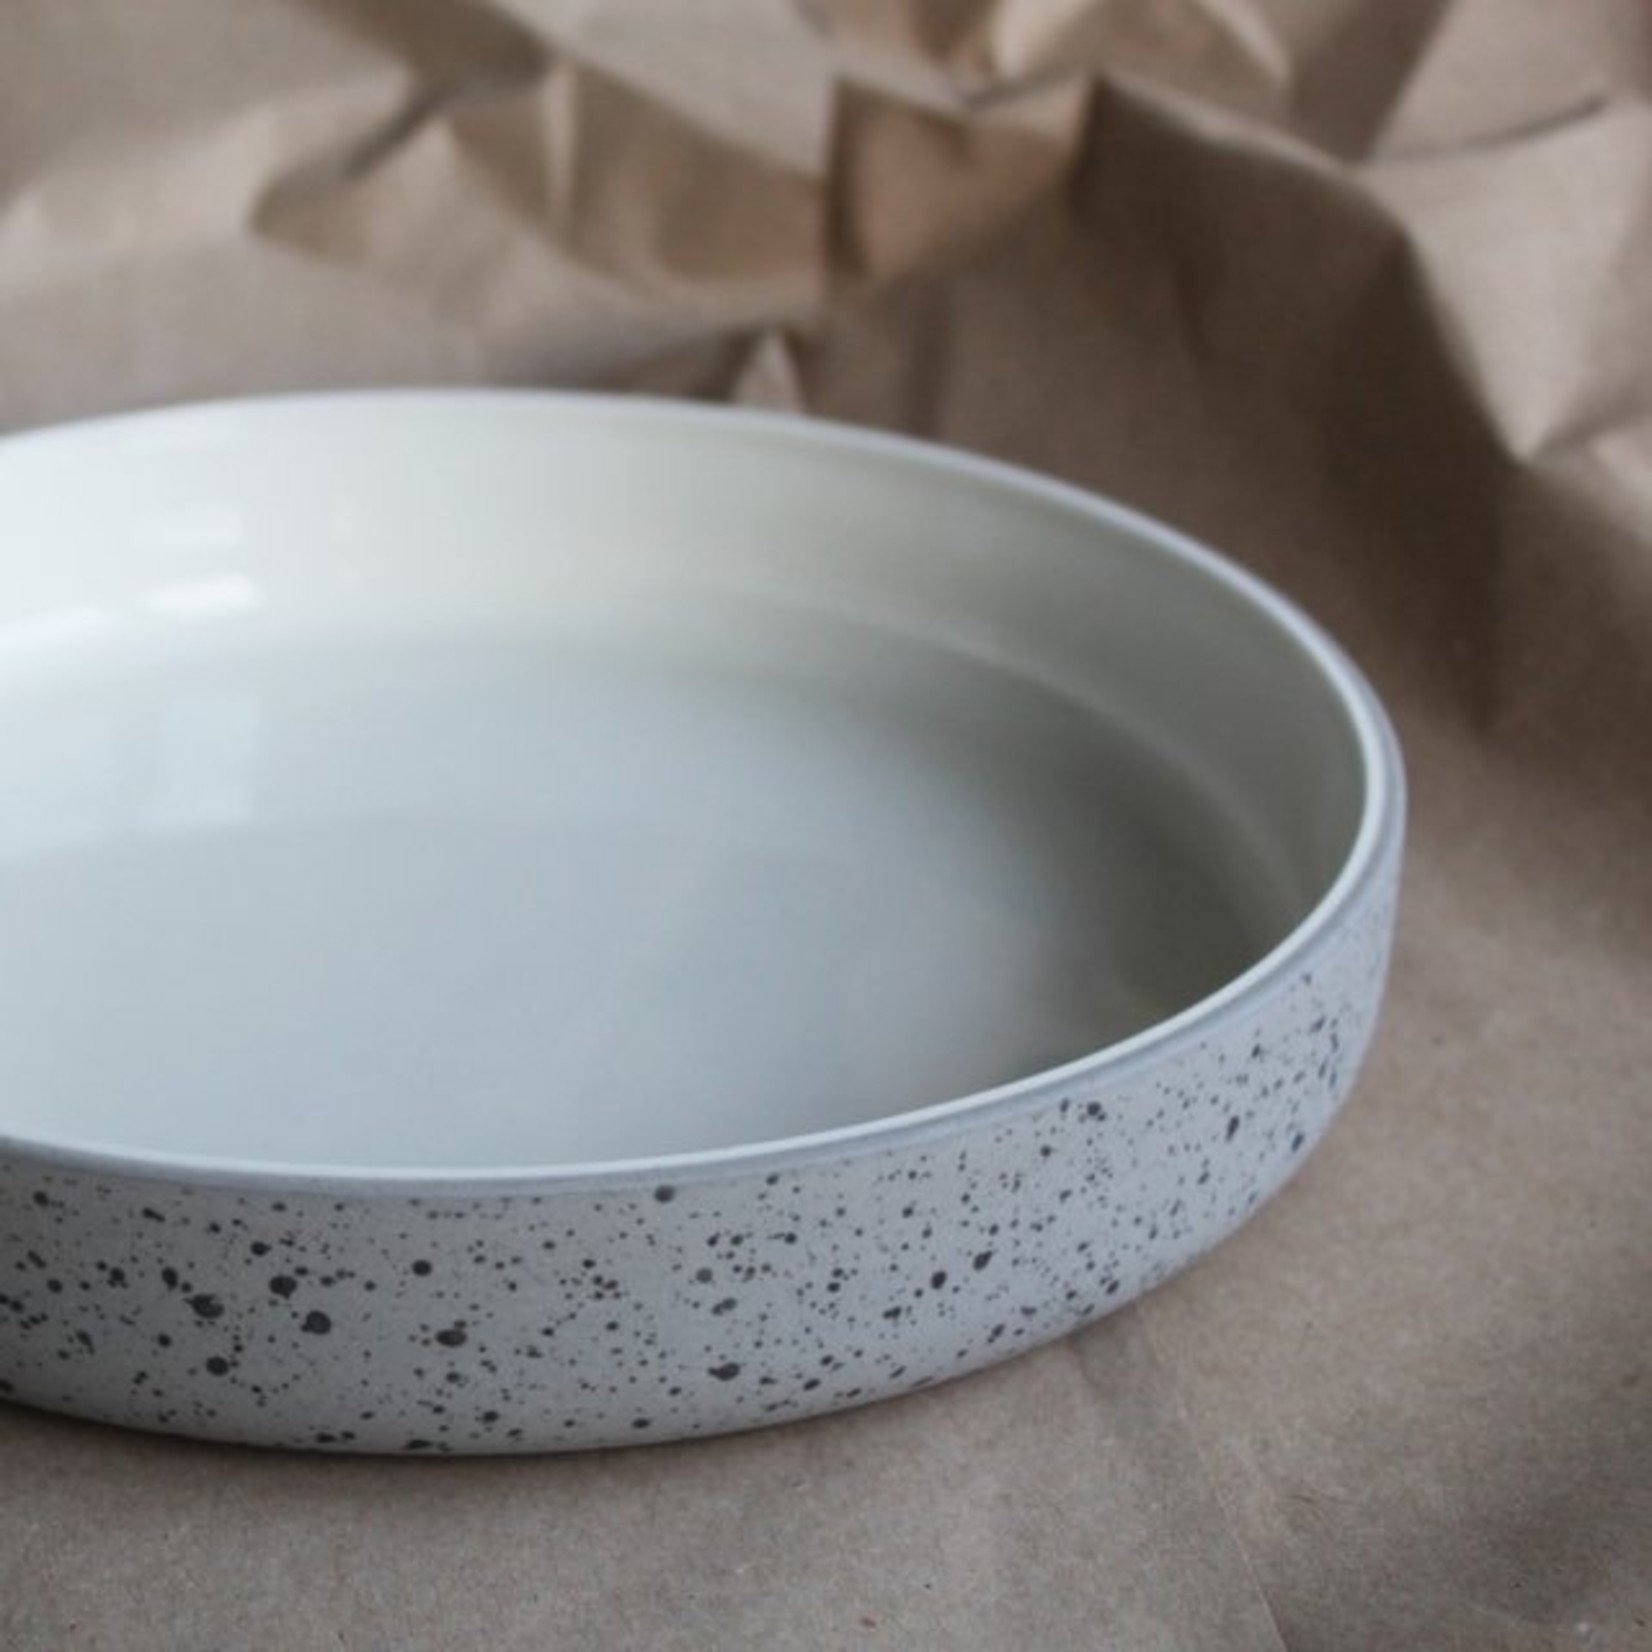 "Archive Studio Archive Studio Handmade 9"" Bowl Speckled"